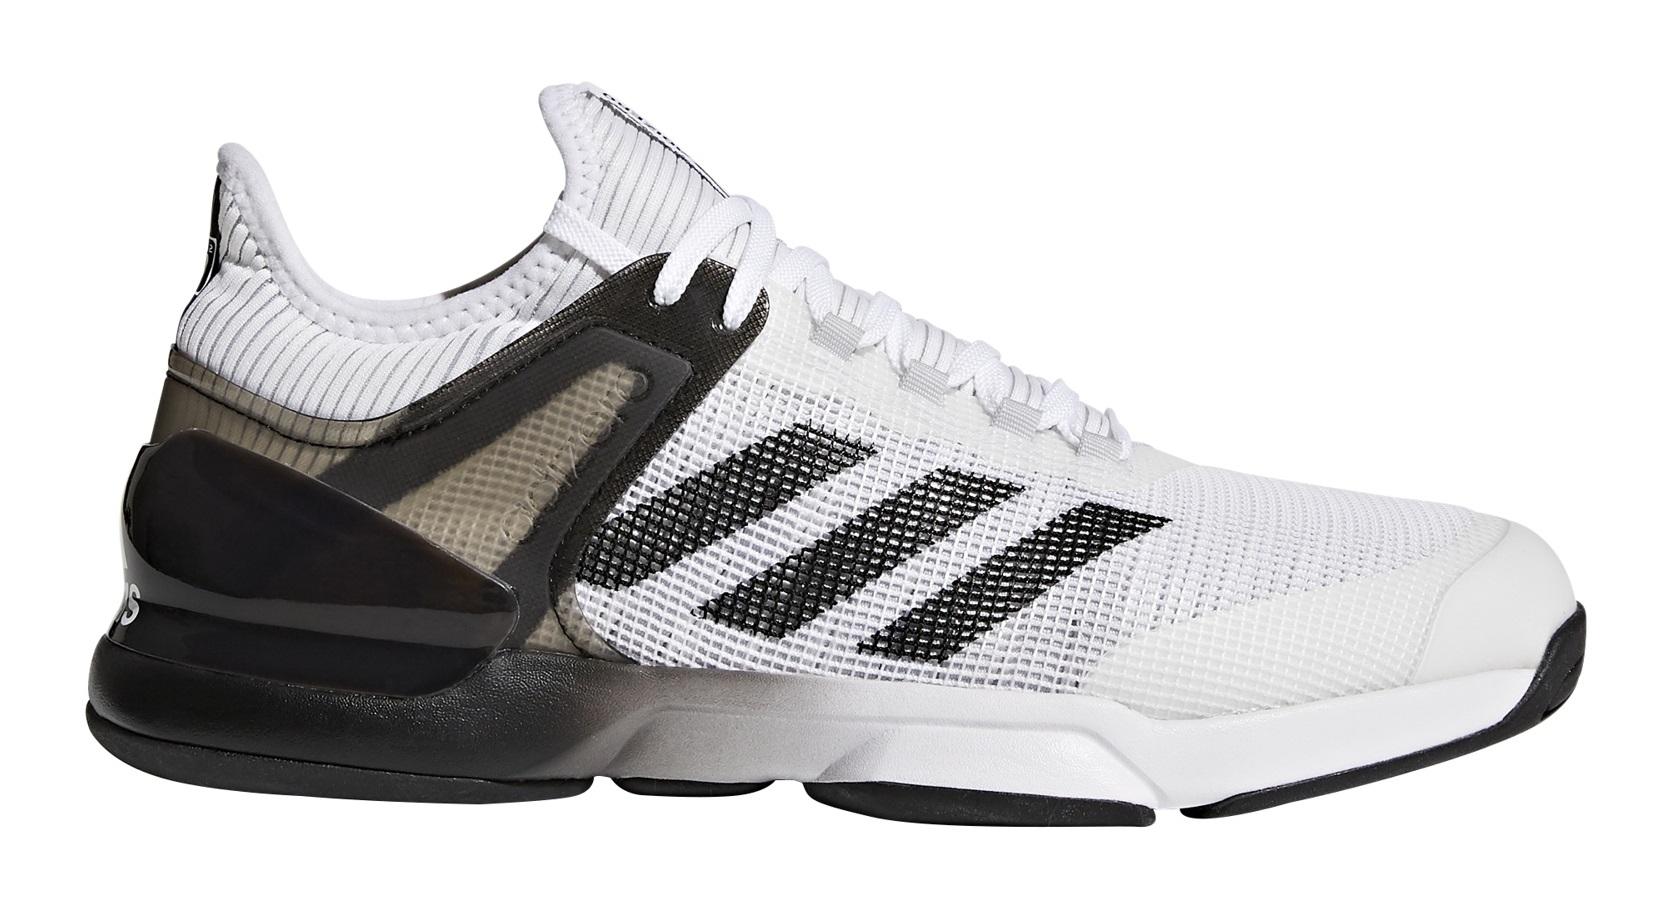 Tennis Shoes Men AdiZero UberSonic 2 colore White Black - Adidas -  SportIT.com 62548067d8f